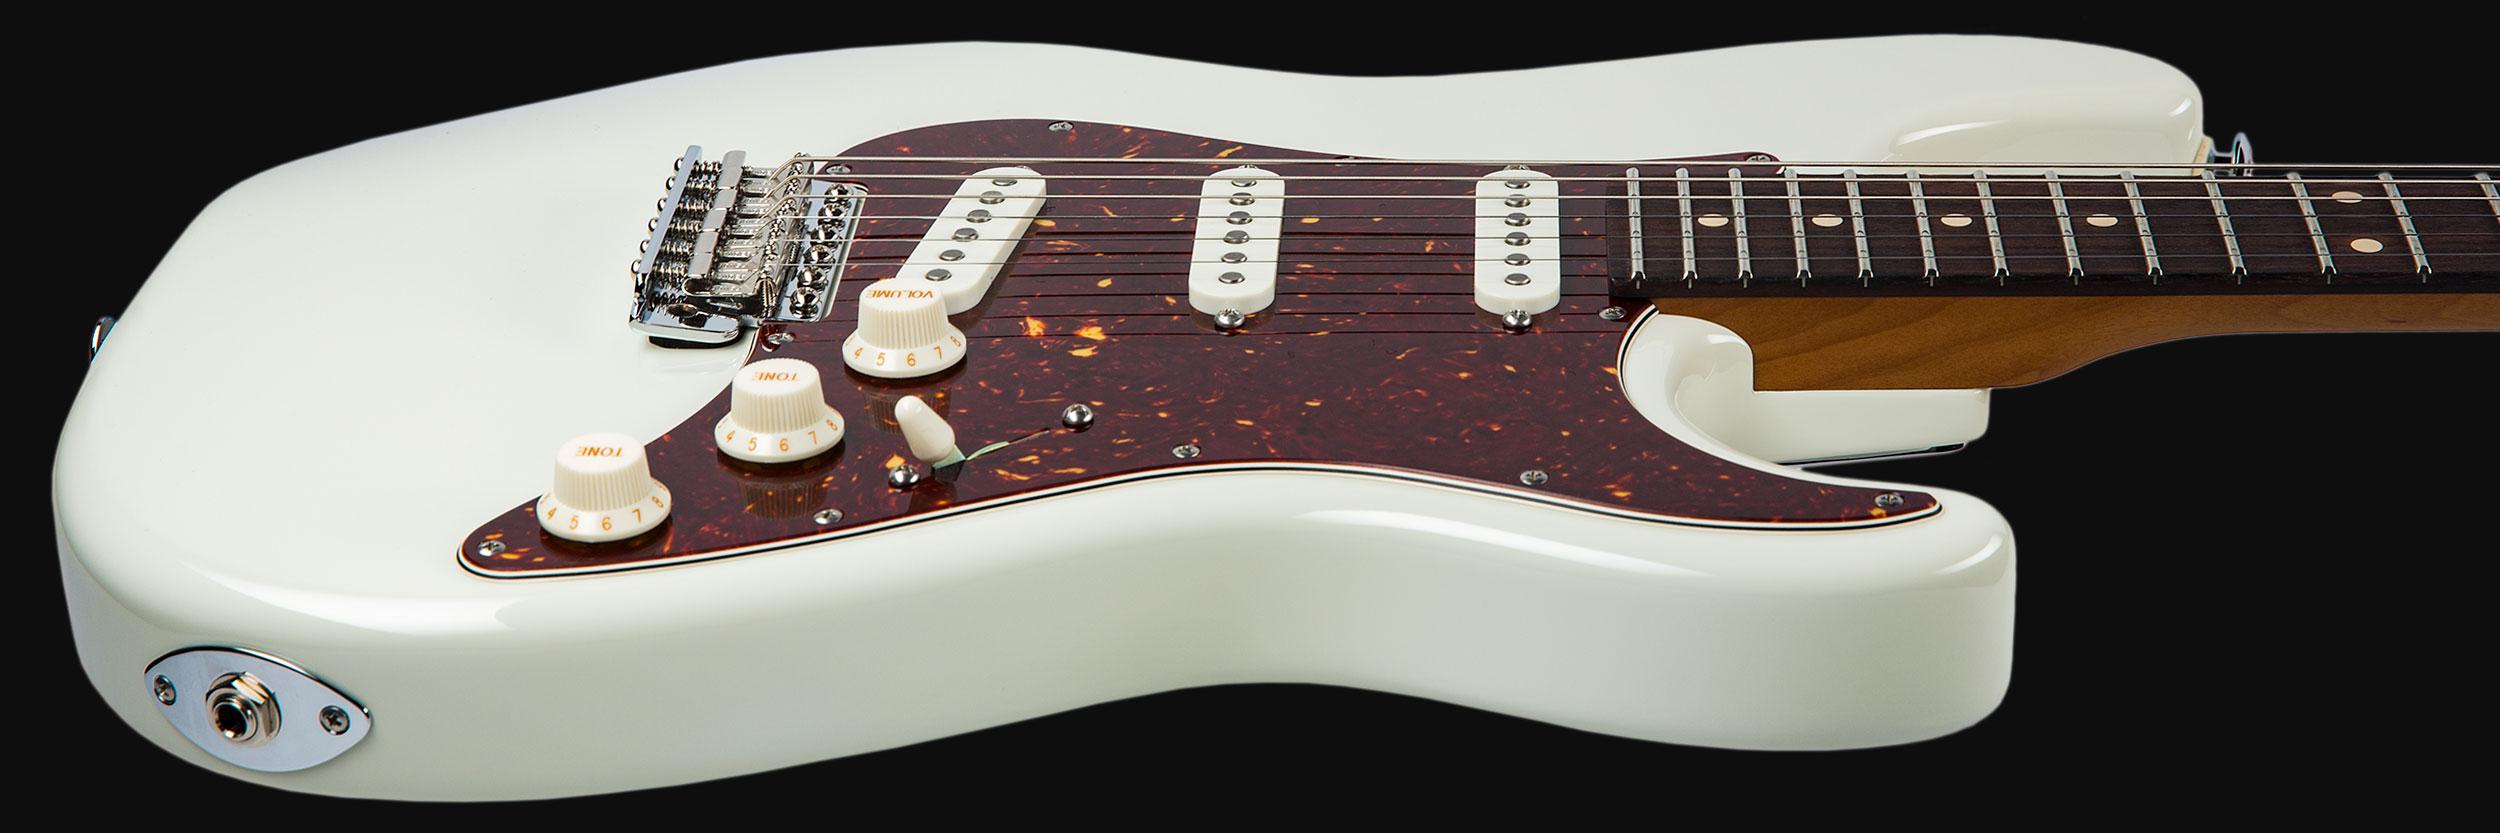 Scott Henderson Suhr Guitars Wiring Diagrams Features